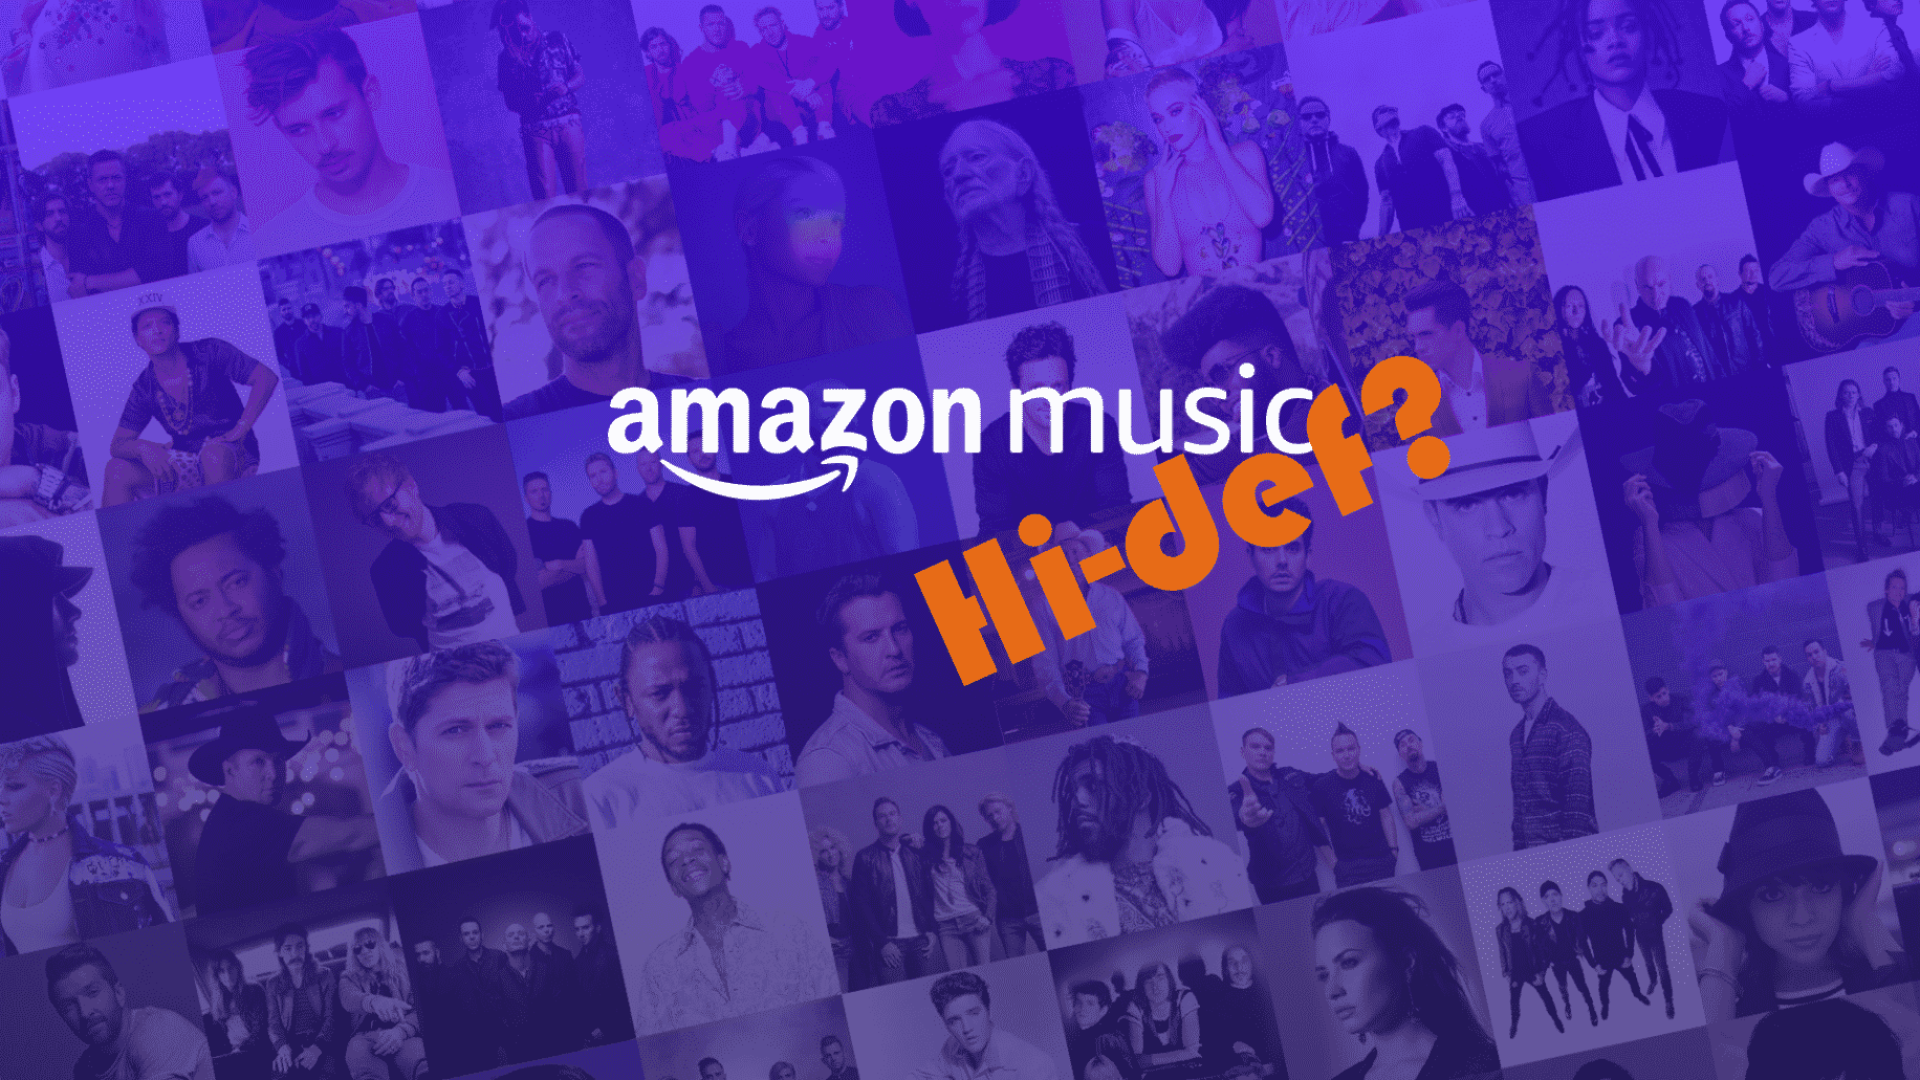 amazon music hi-def streaming edit